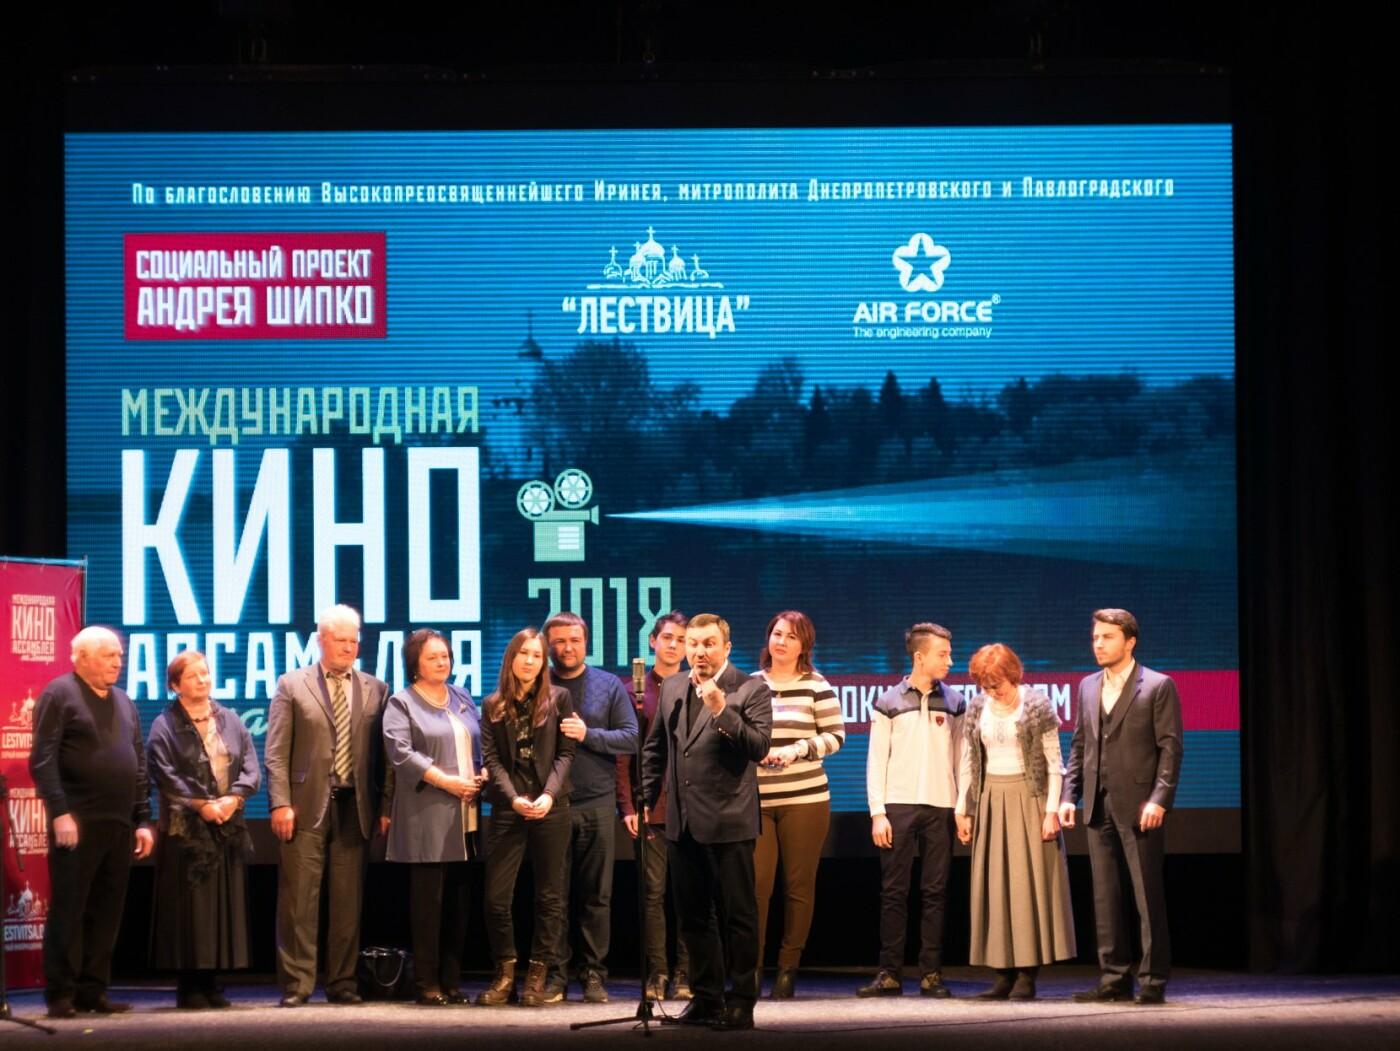 Киноассамблея на Днепре-2018: как прошла церемония открытия кинофорума (ФОТО), фото-6